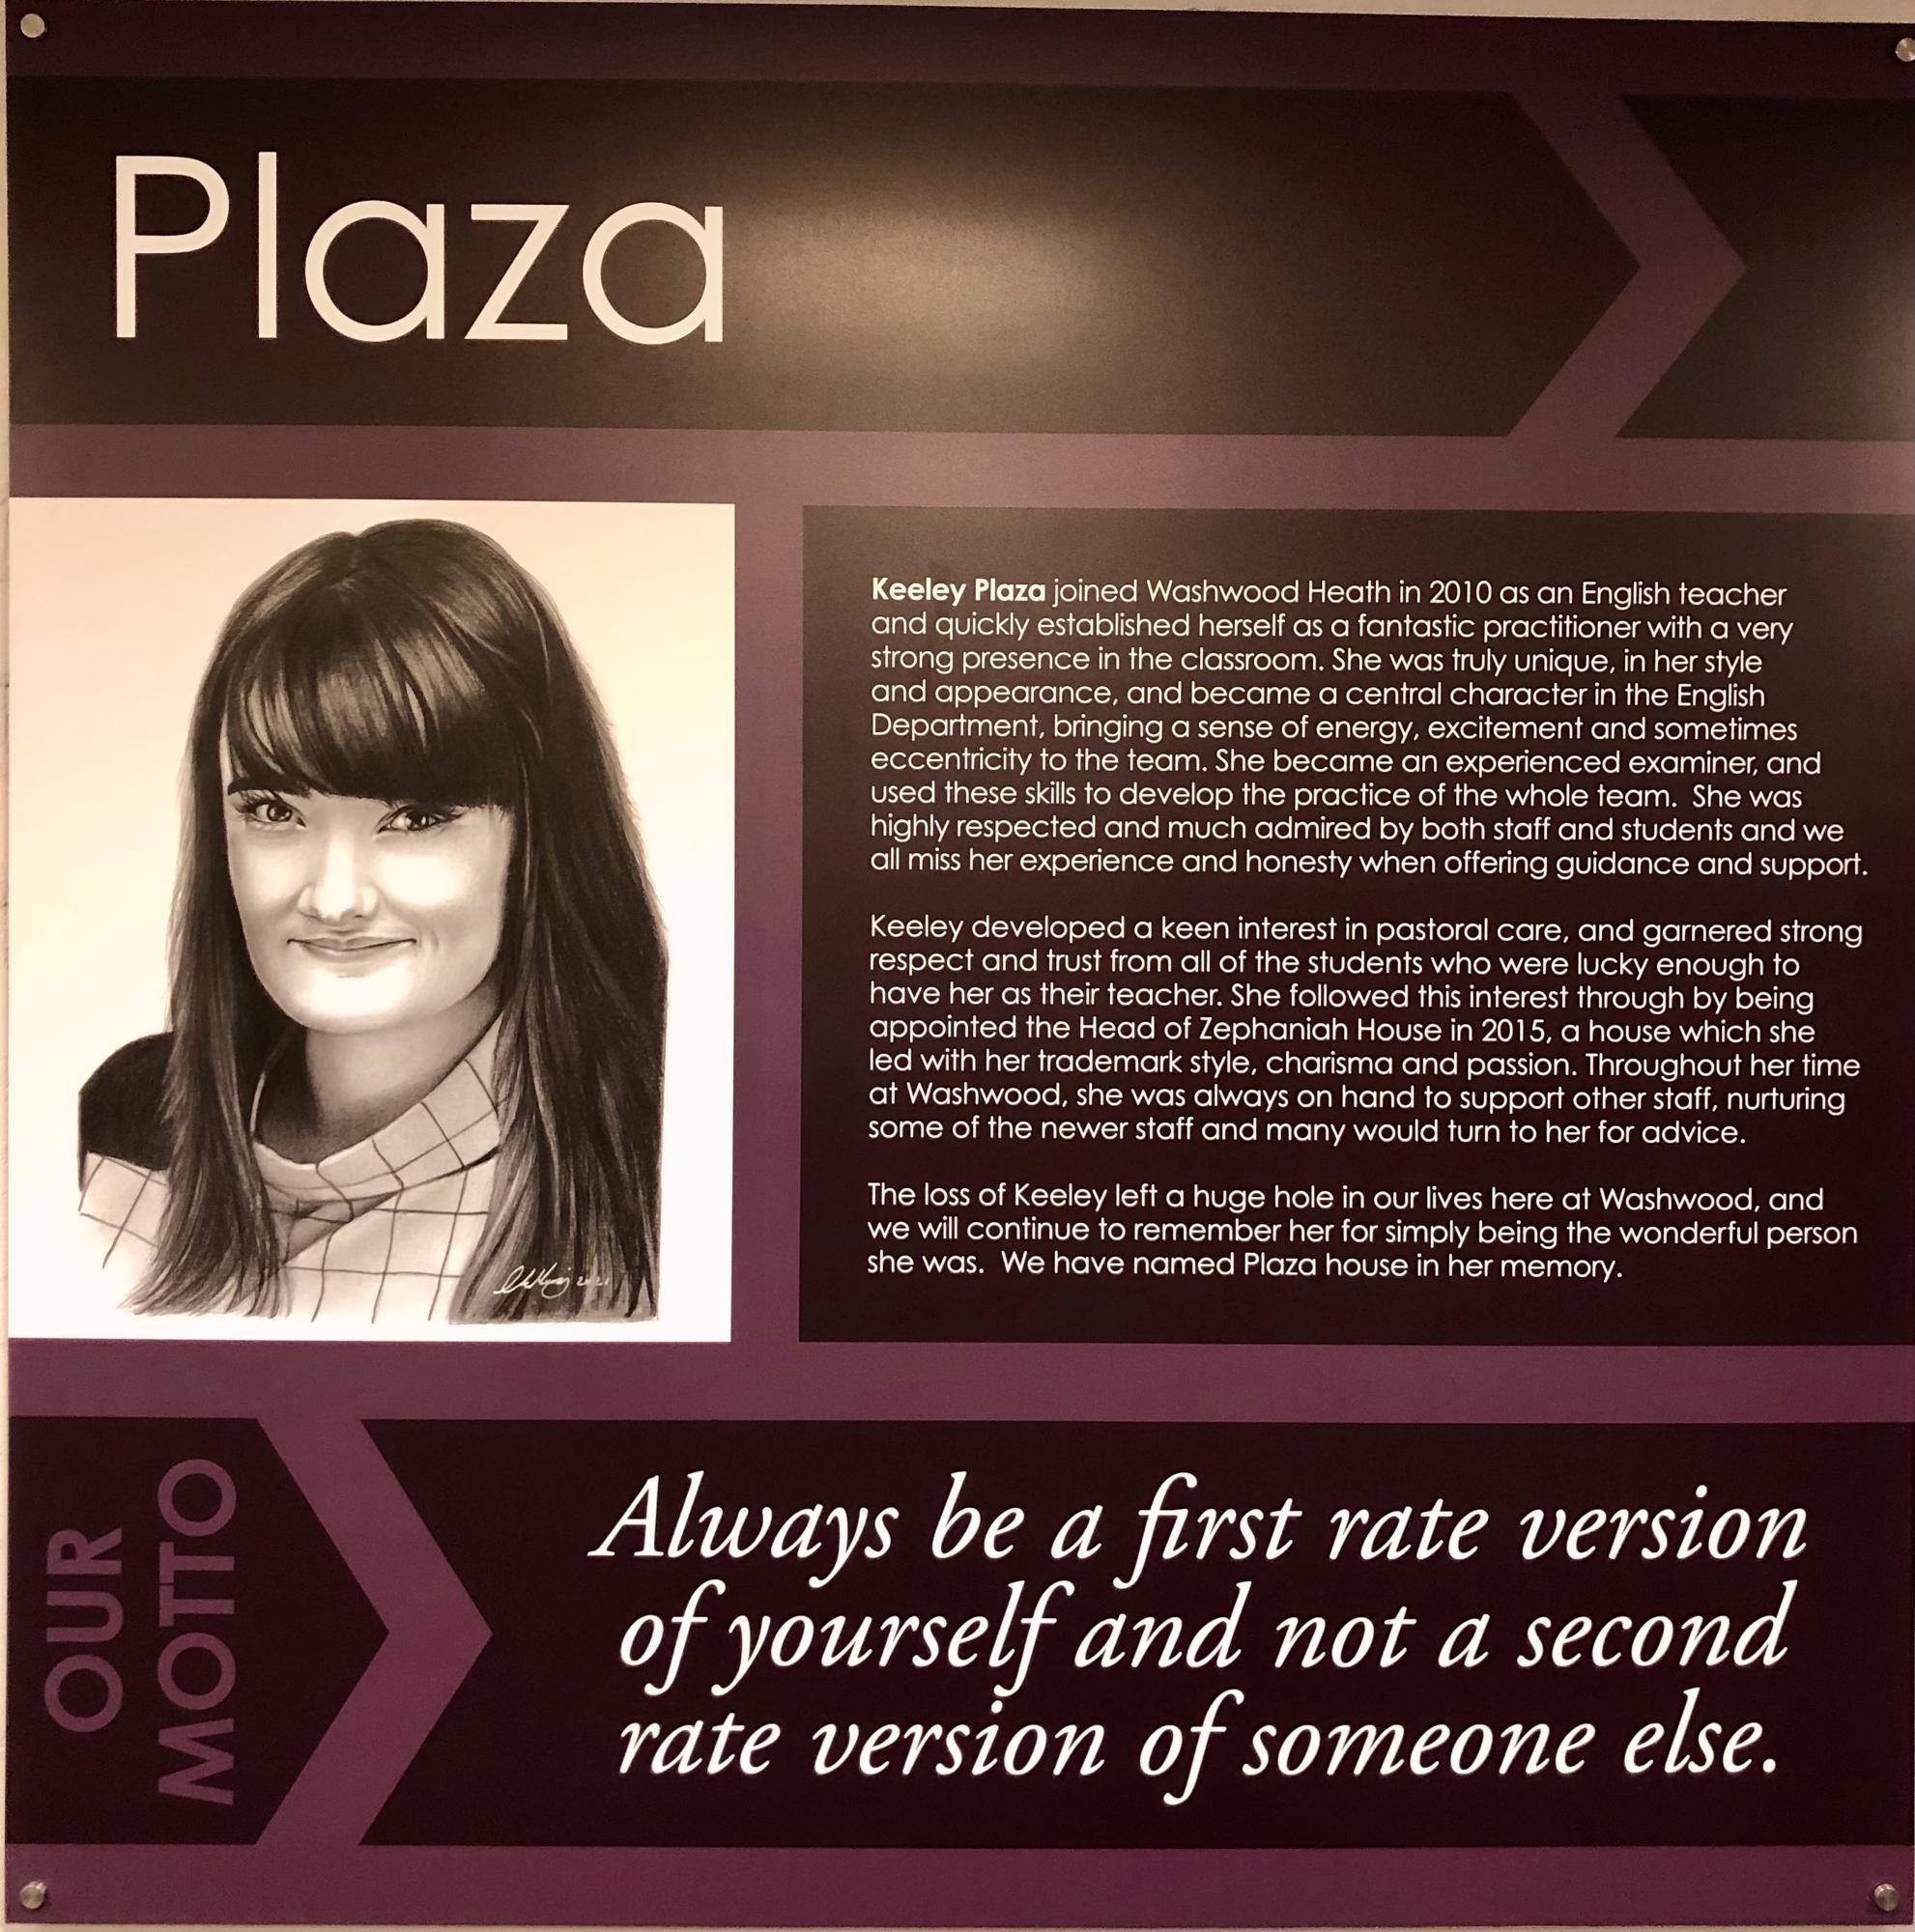 Plaza House